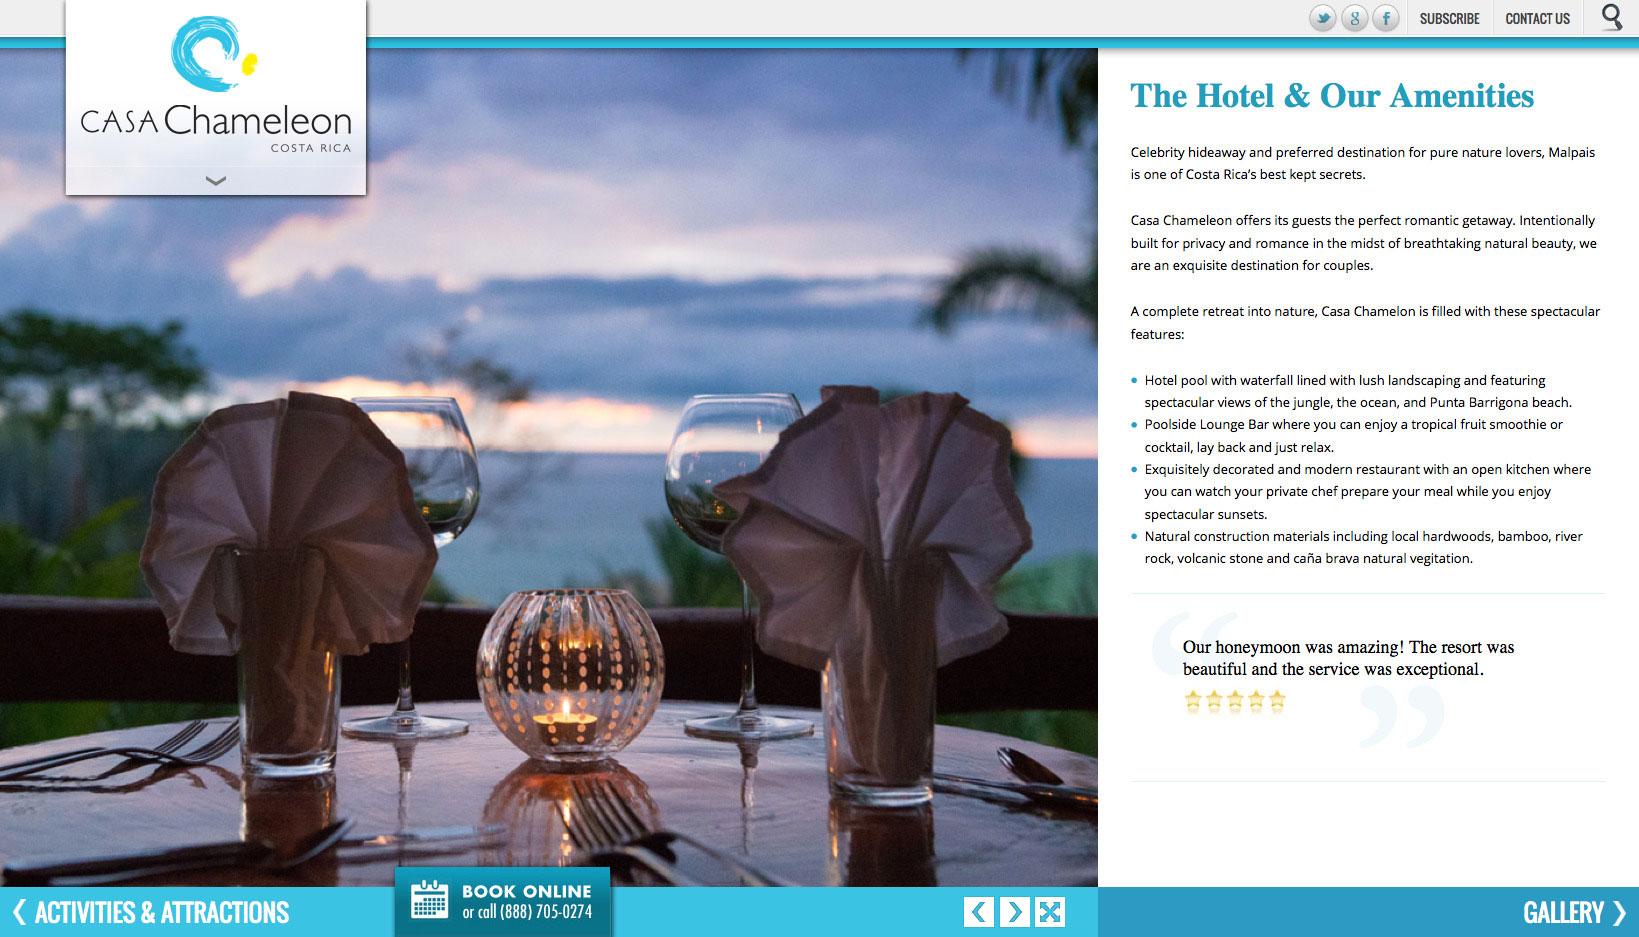 The-Hotel-&-Our-Amenities-_-Casa-Chameleon4.jpg